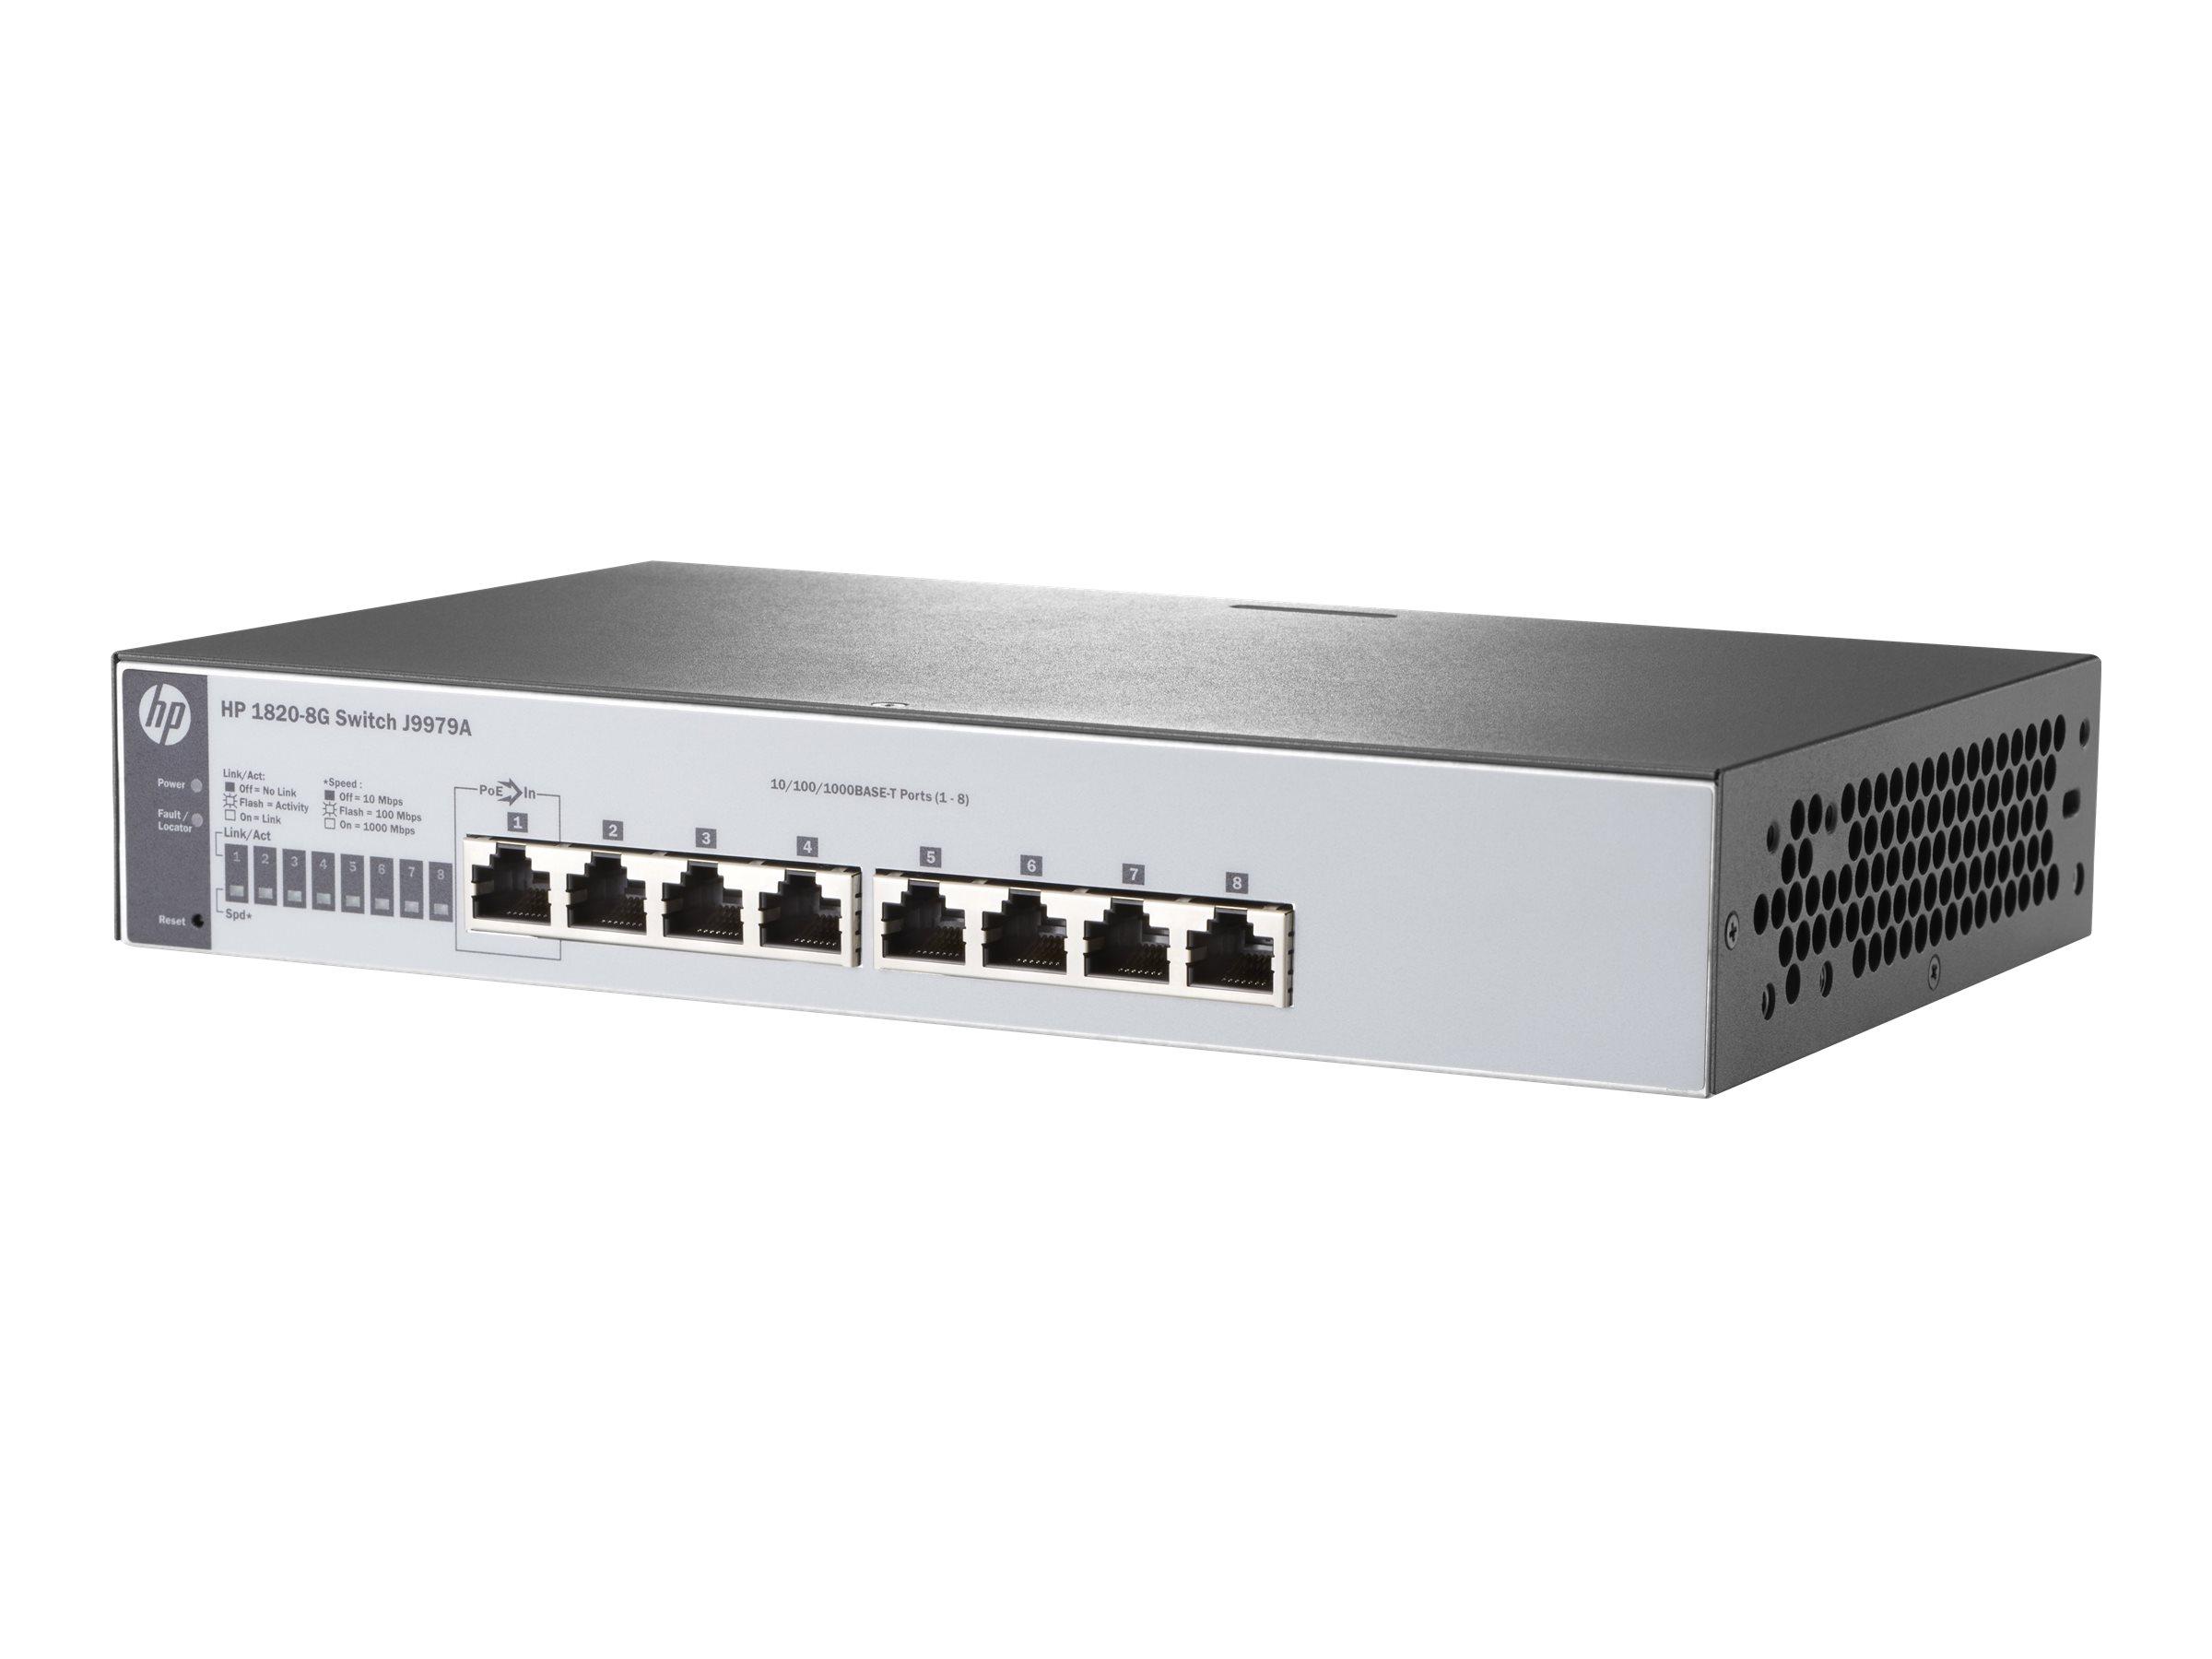 HP 1820-8G - Switch - verwaltet - 8 x 10/100/1000 - Desktop, an Rack montierbar